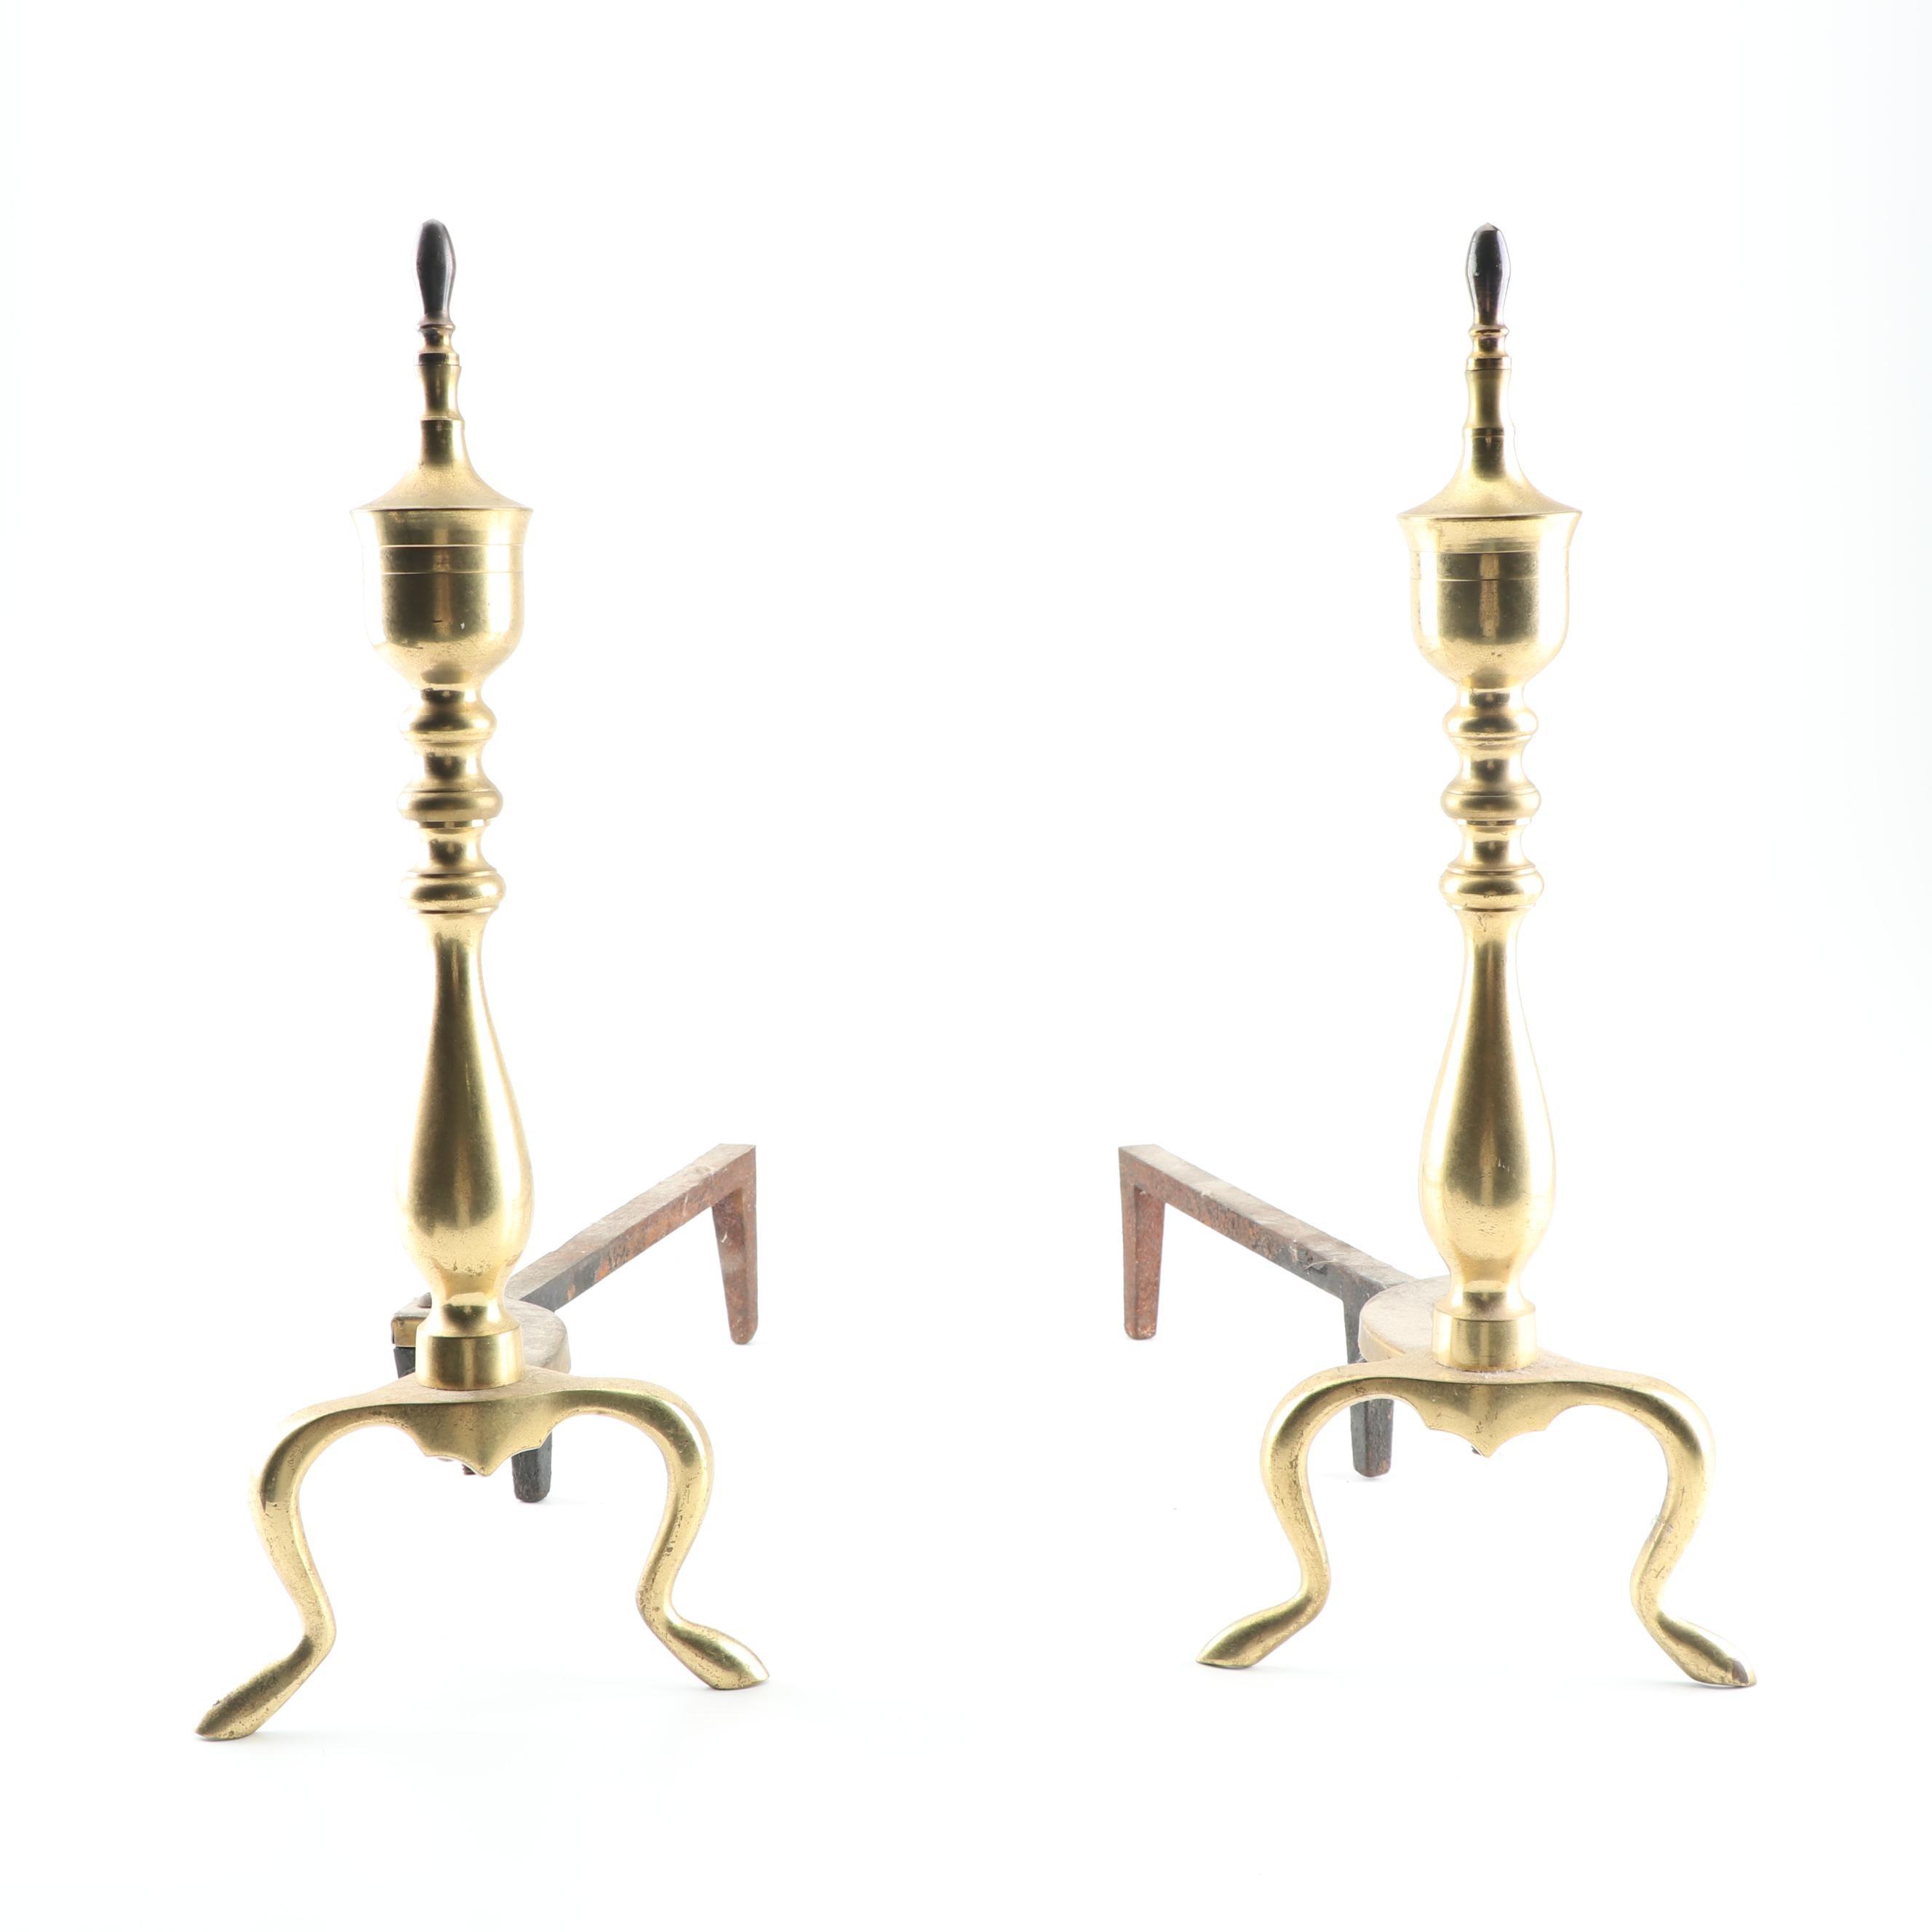 Brass Plated Andirons